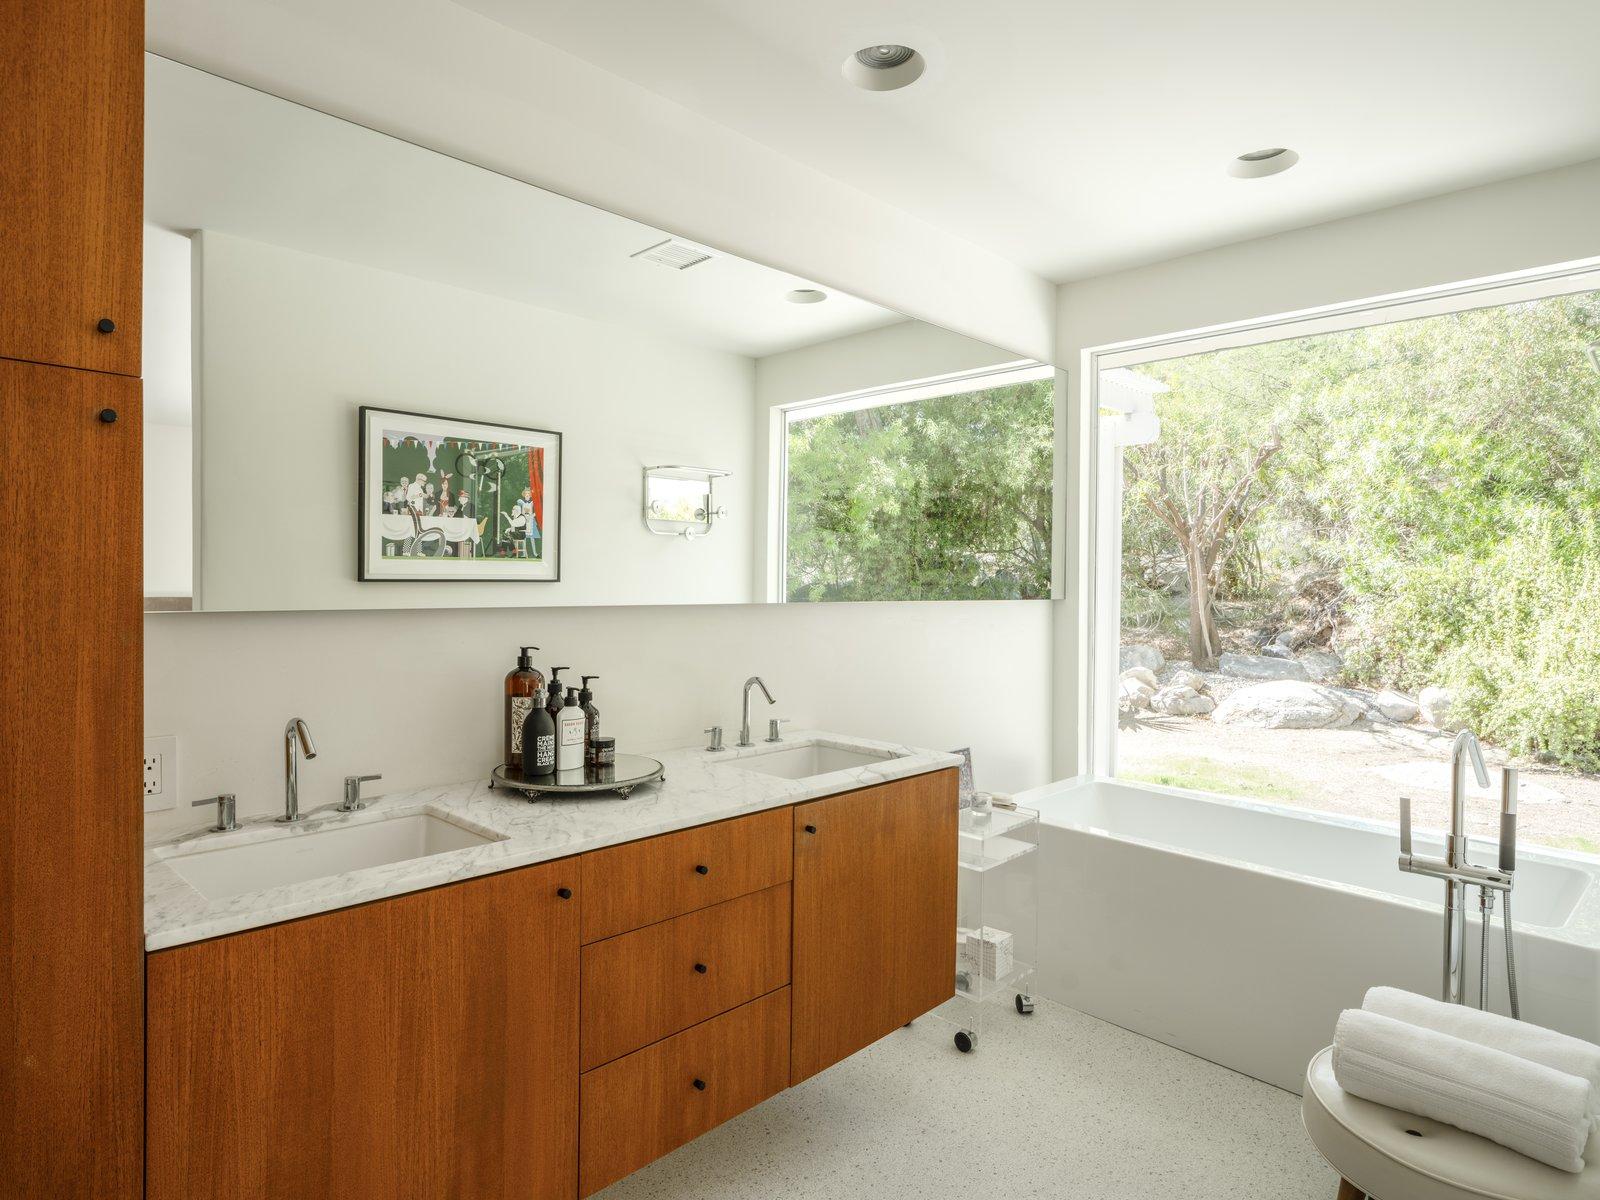 William Cody Palm Springs Midcentury Bathroom